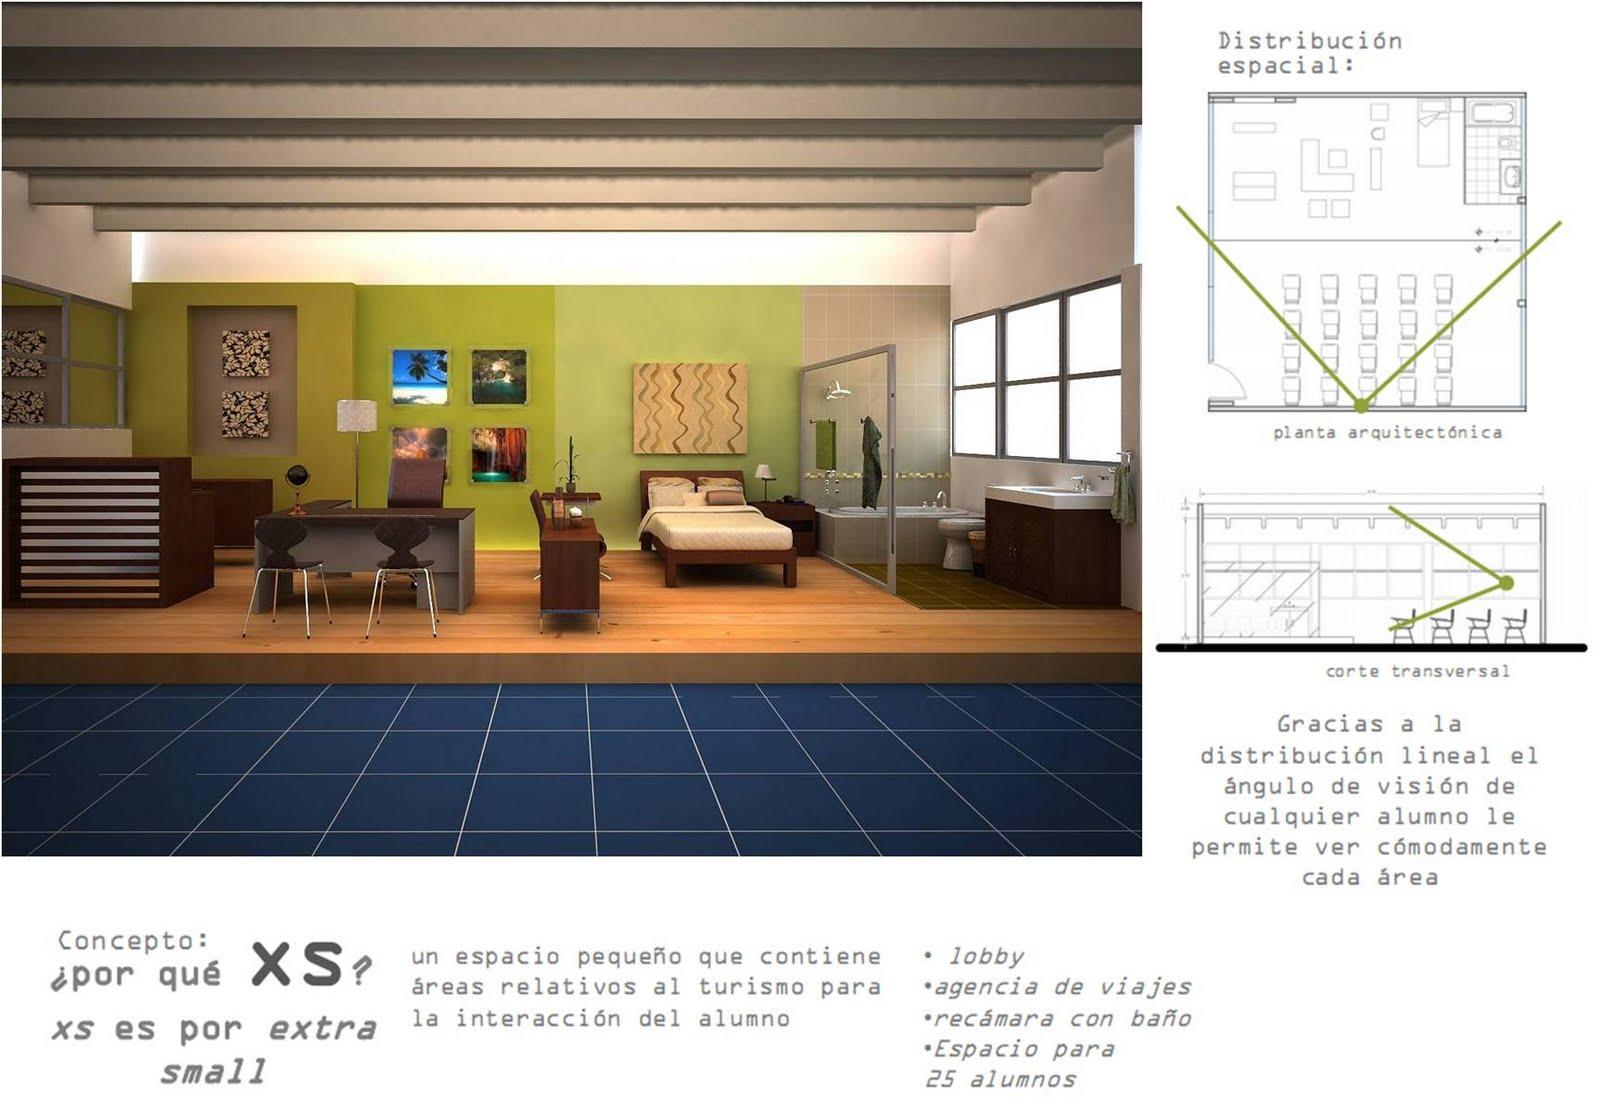 Dise o de espacios interiores concurso interno en la for Disenar espacios interiores